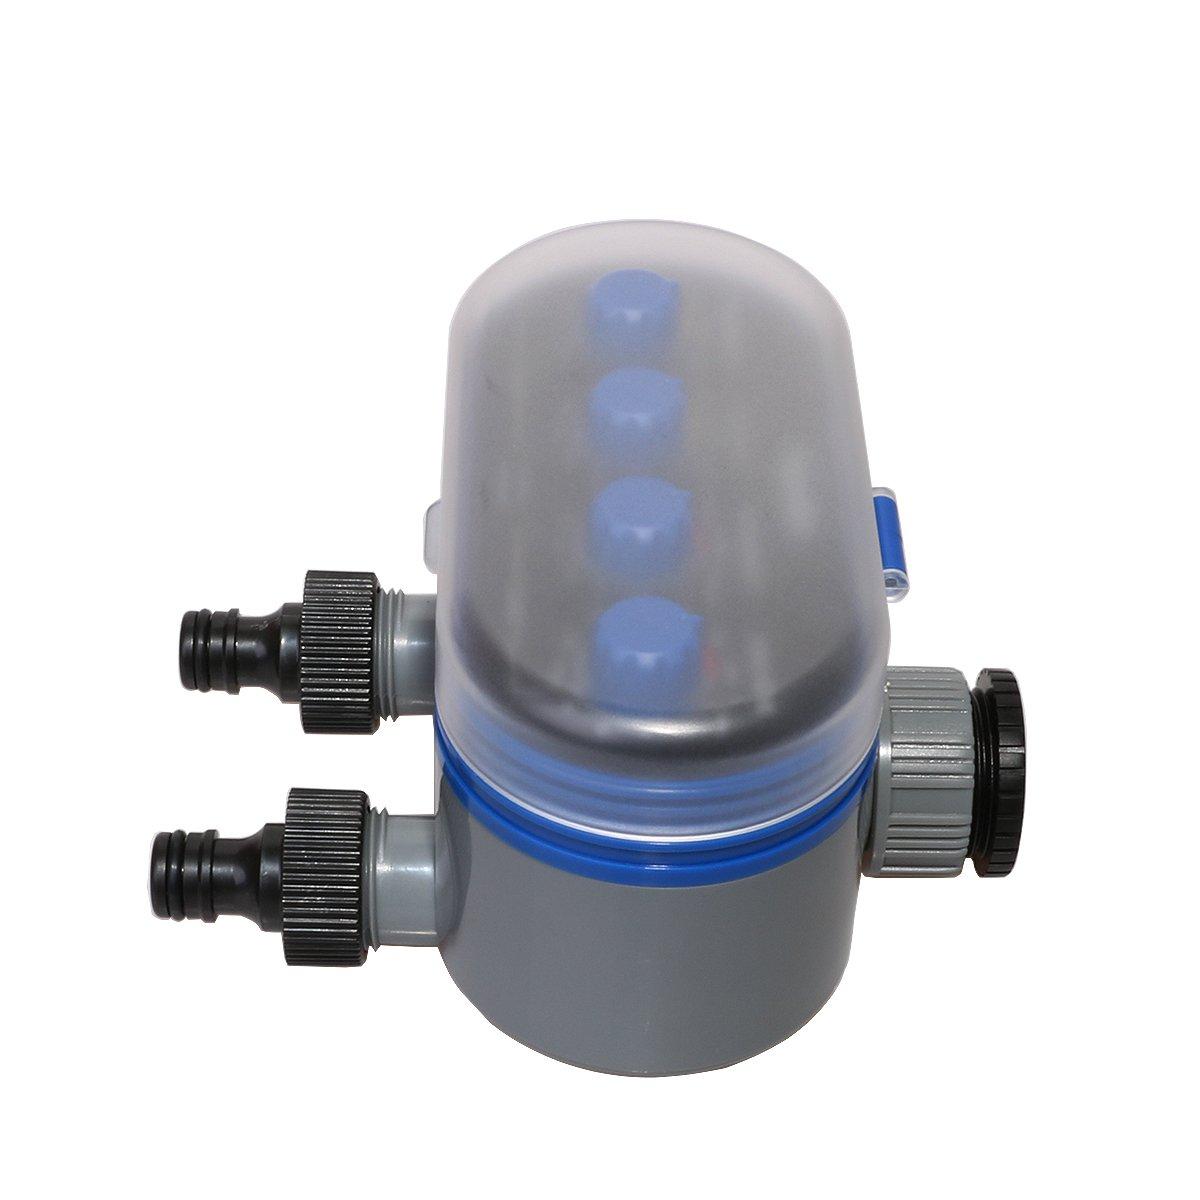 Aqualin Programador de riego Temporizador de riego con 2 Salidas Independientes